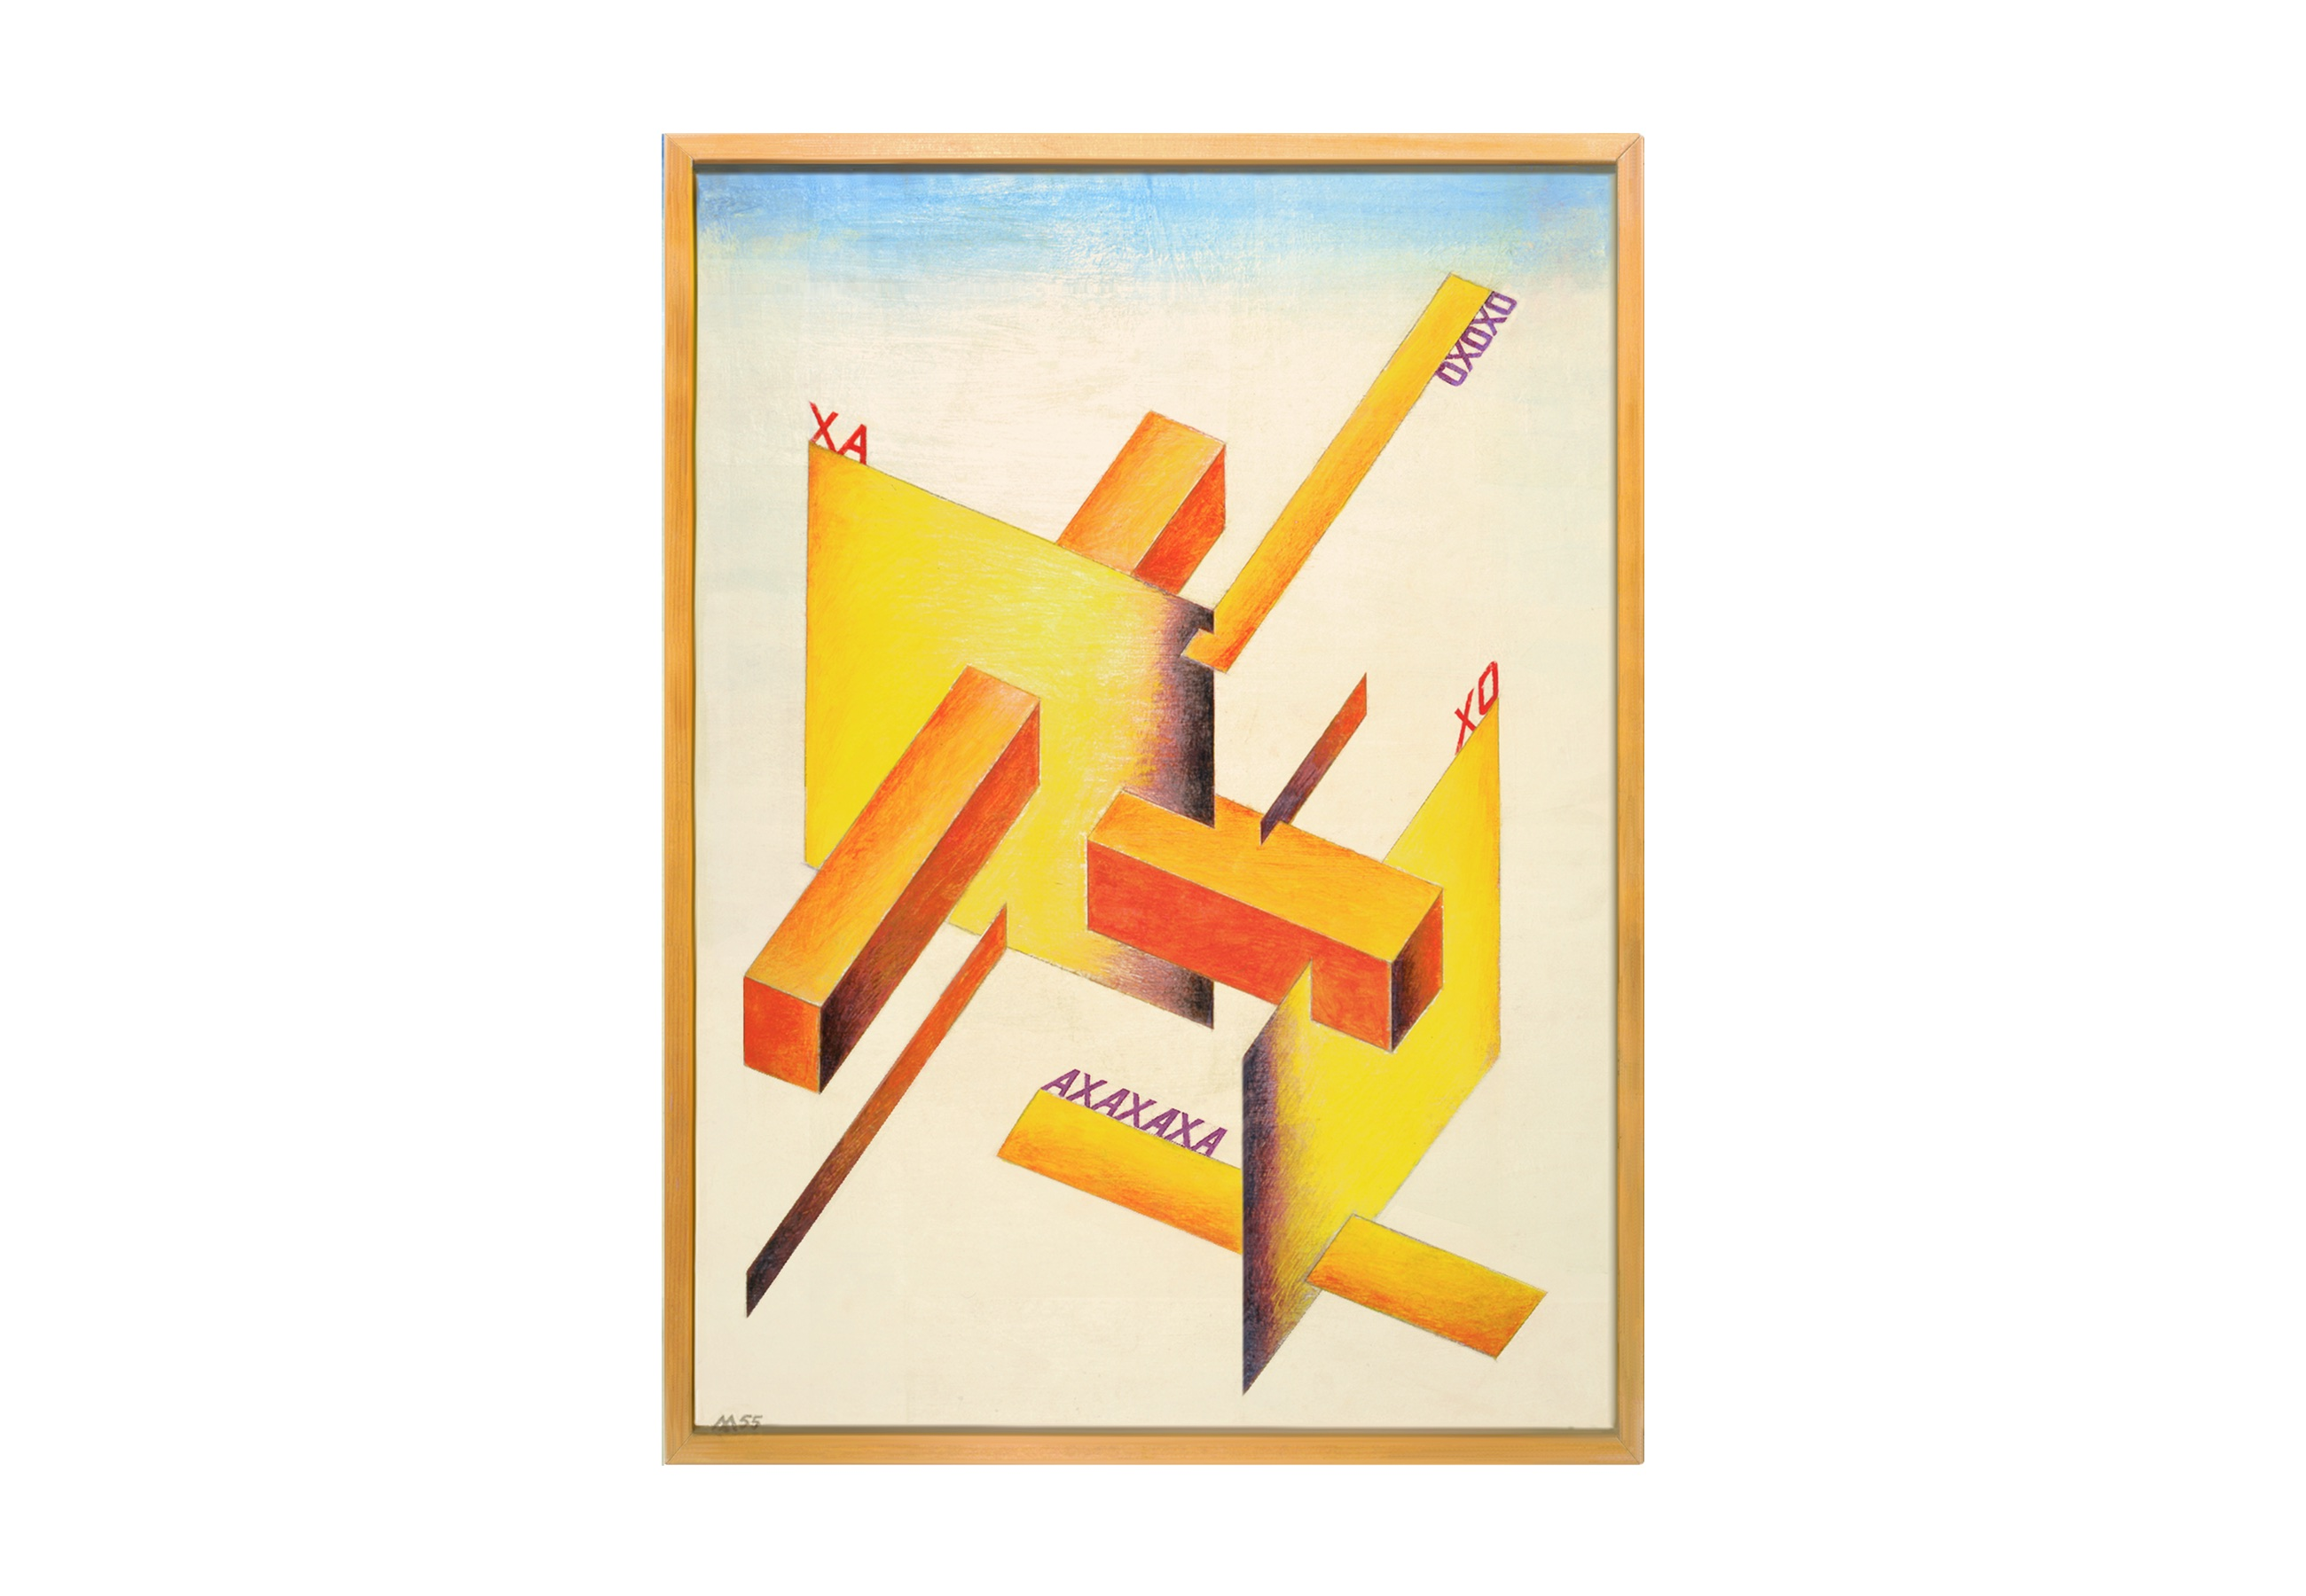 Lamm-Portfolio-1954-1955-33.jpg